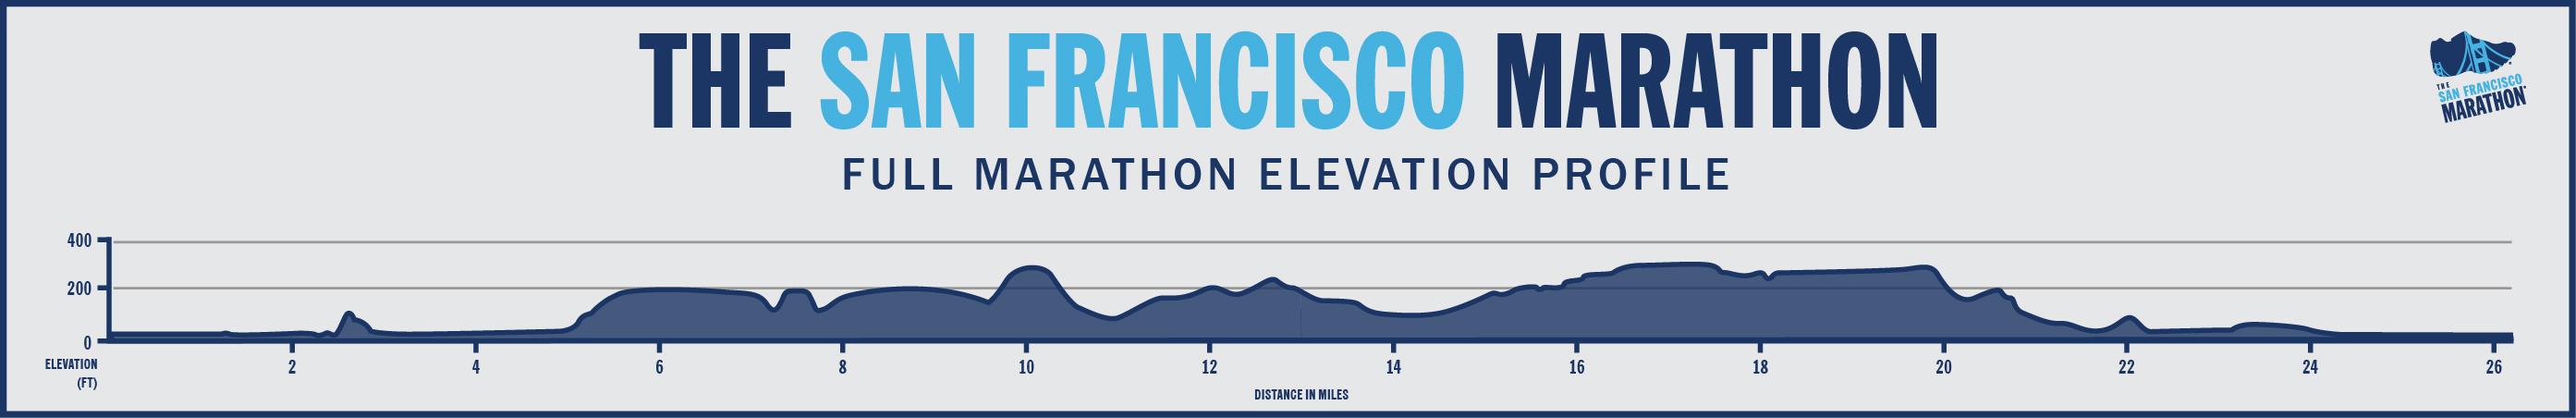 Elevation map for SF Marathon